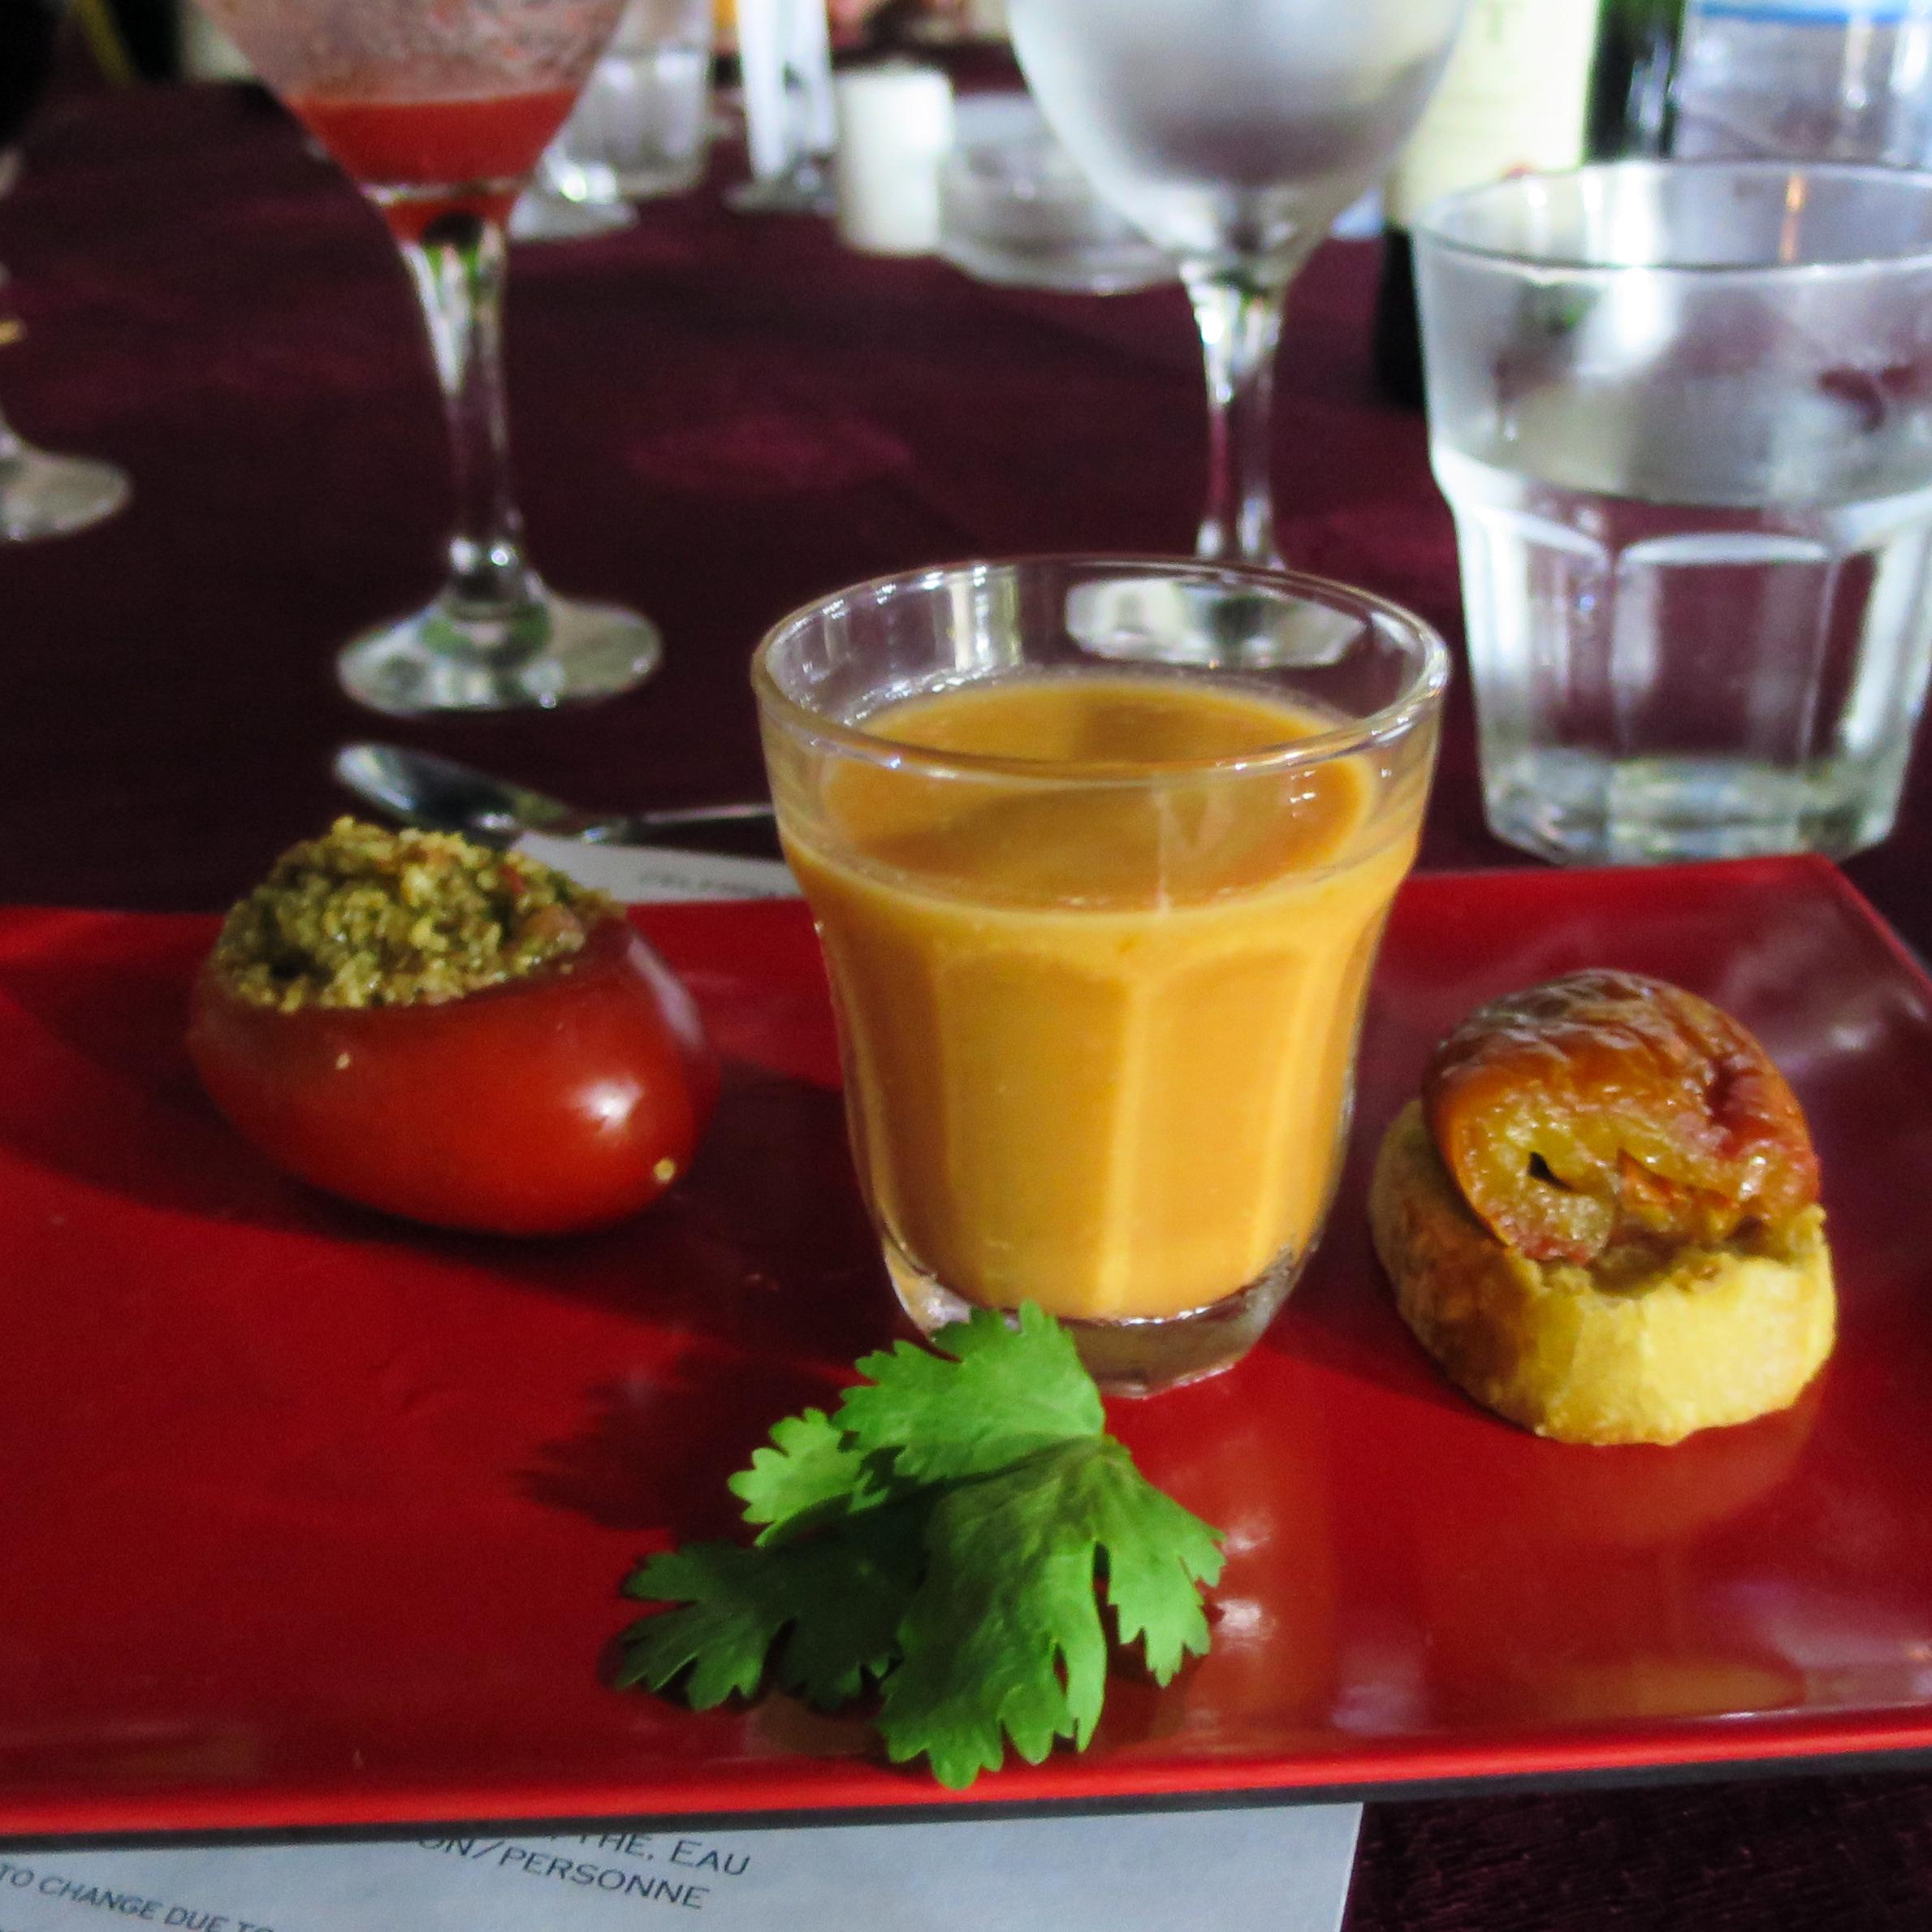 A couscous-stuffed tomato, tomato gazpacho and a piece of bruschetta at a recent Trio Toques event.